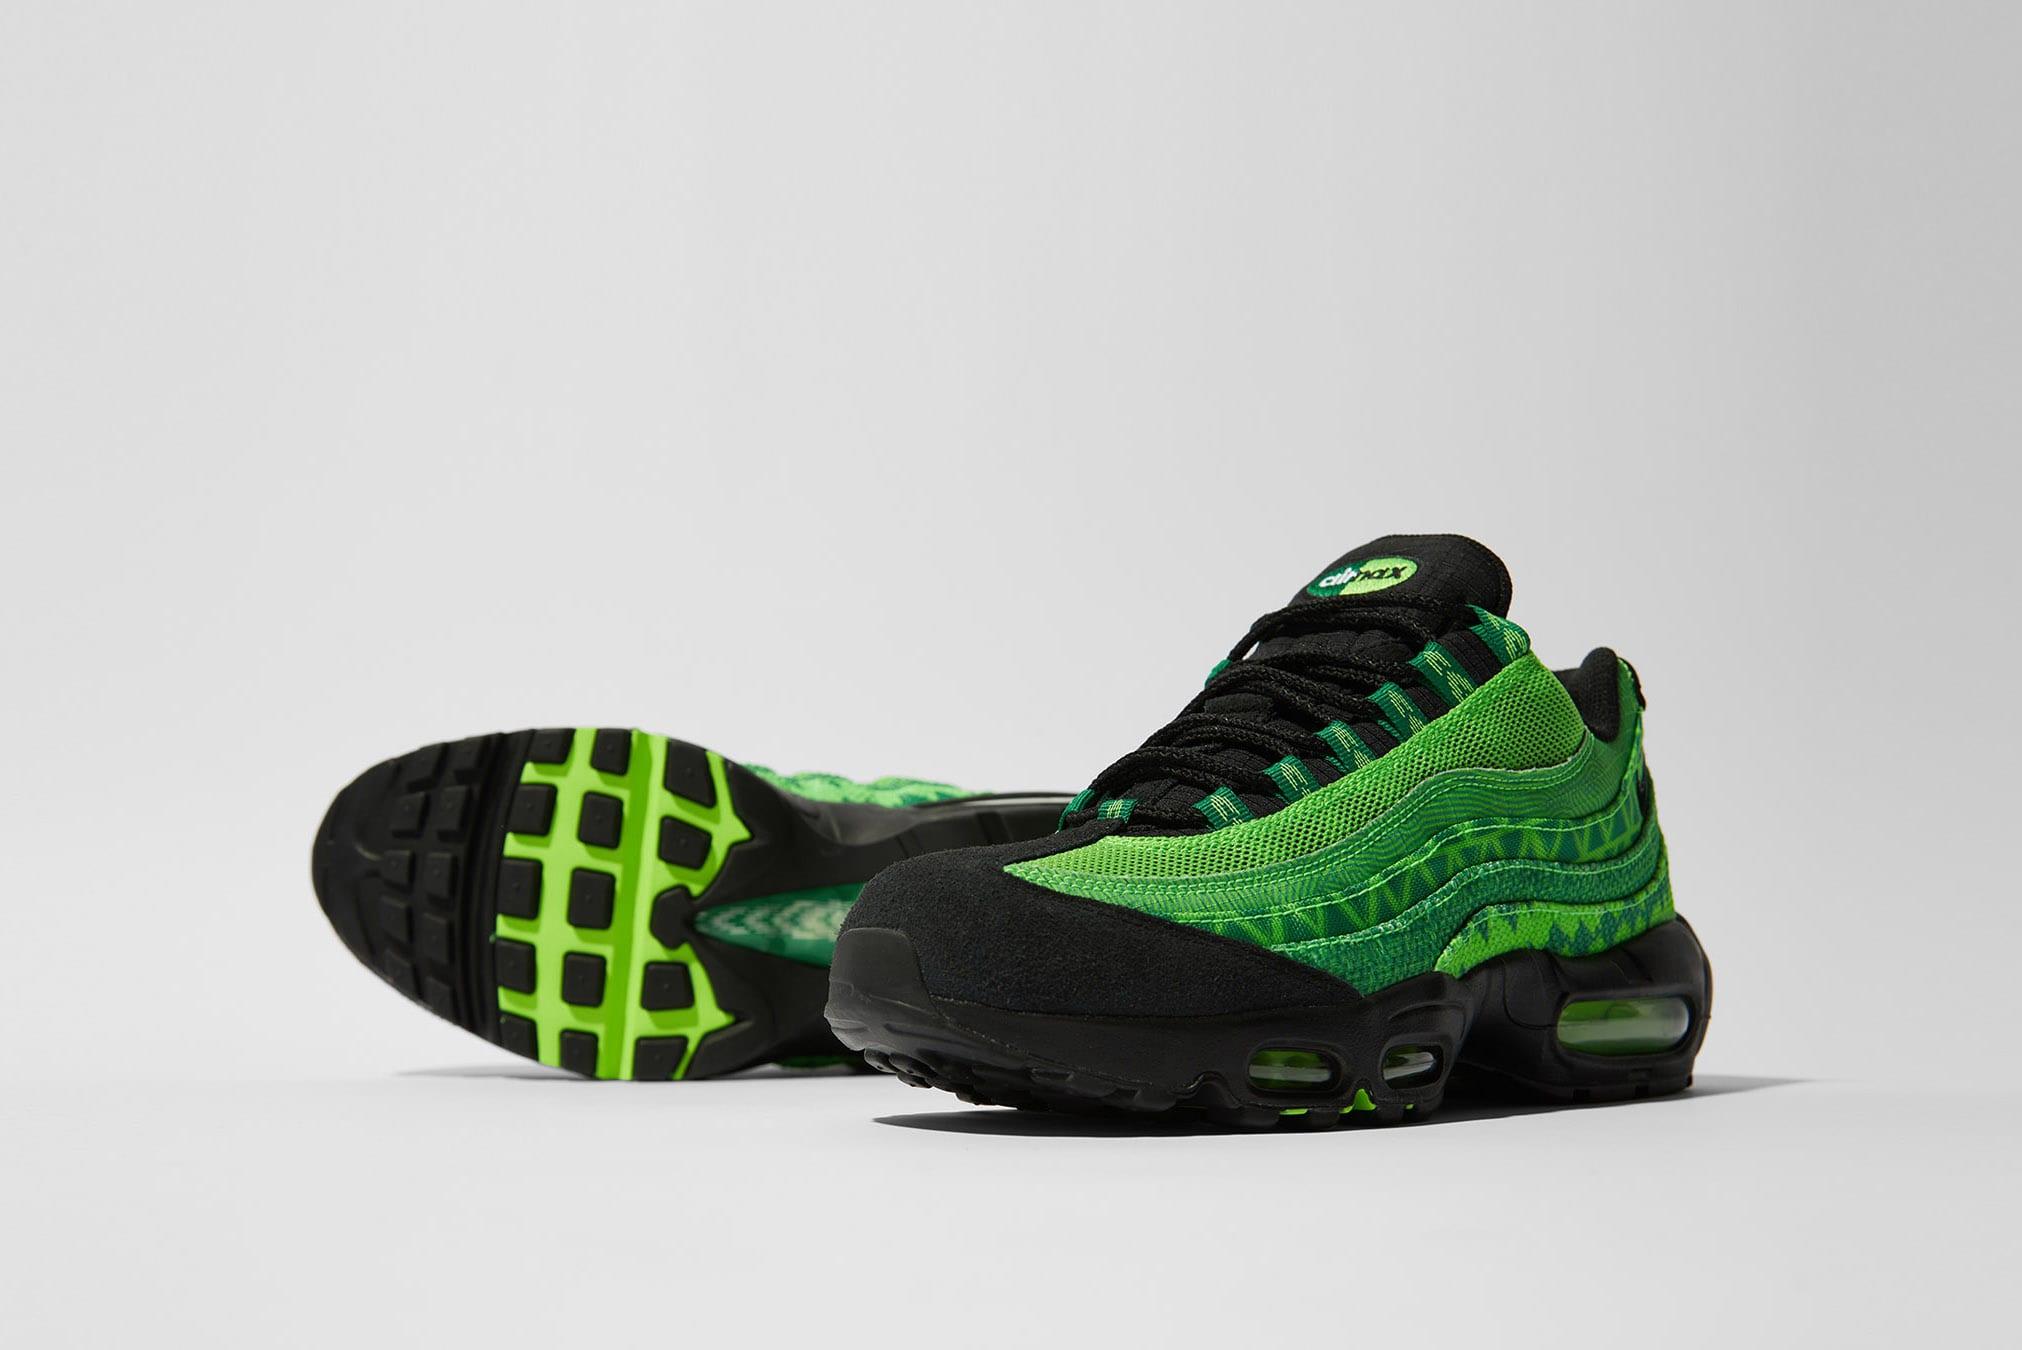 Nike Air Max 95 Nigeria - CW2360-300